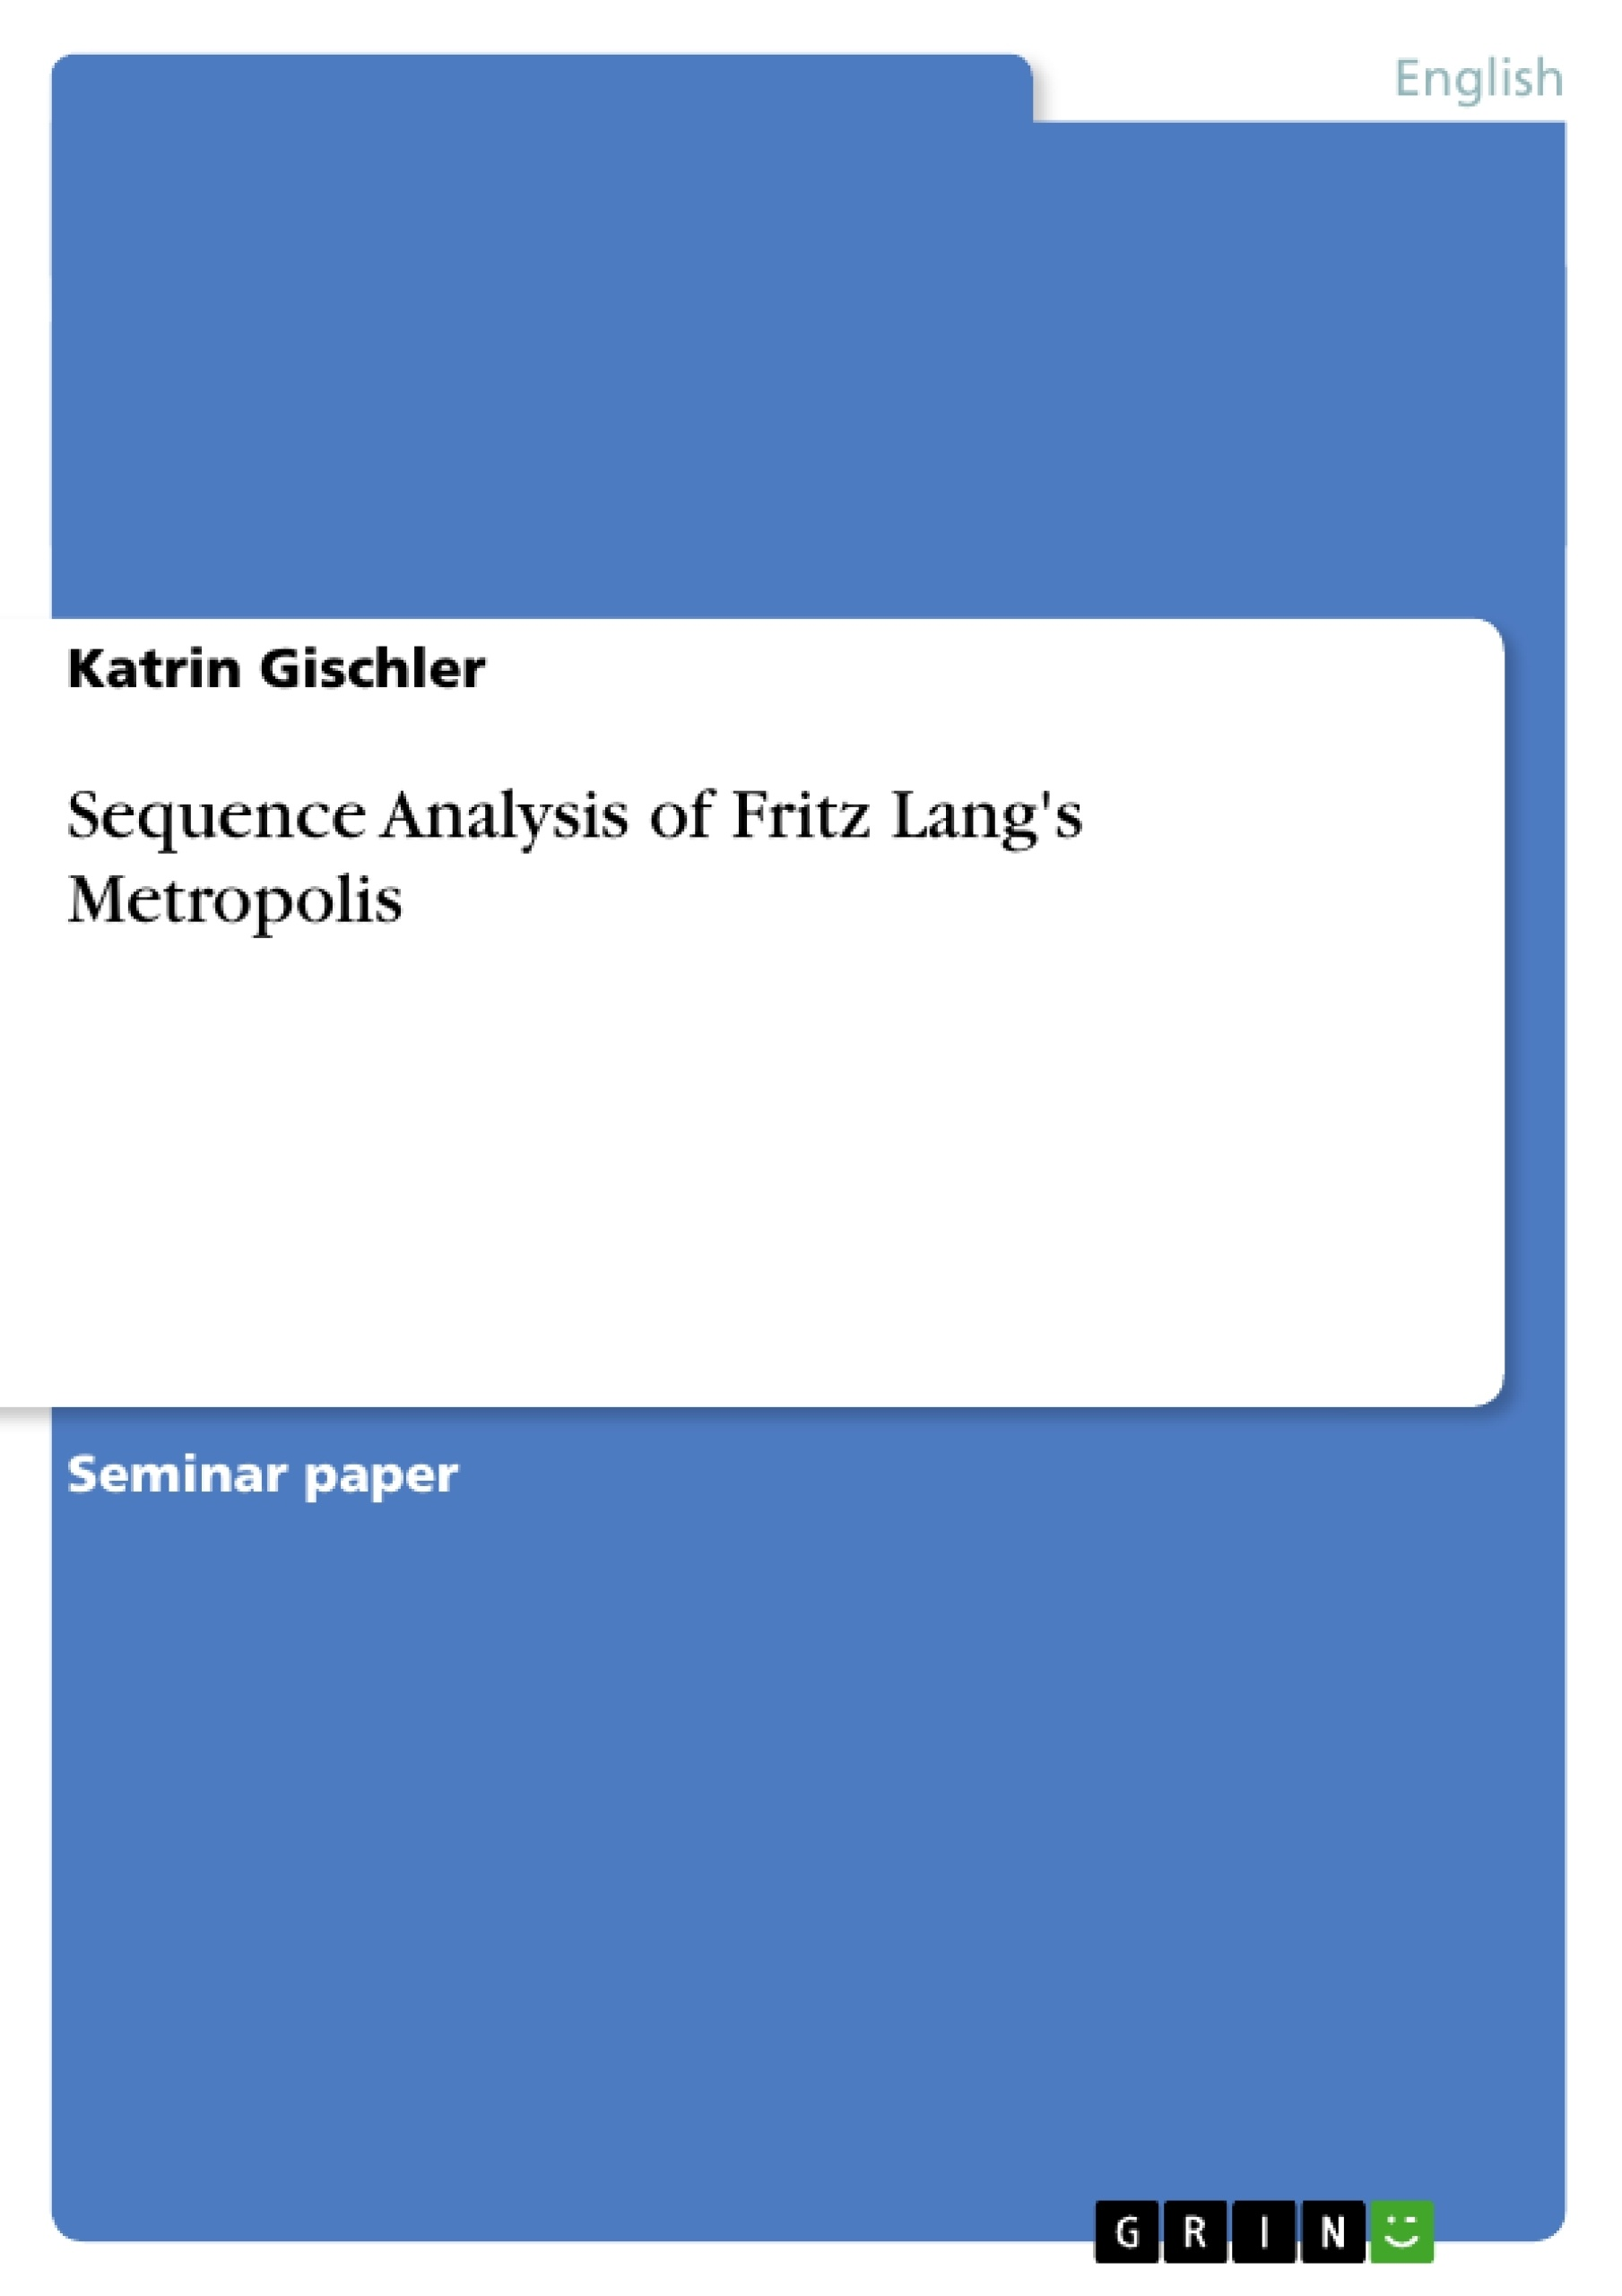 Title: Sequence Analysis of Fritz Lang's Metropolis